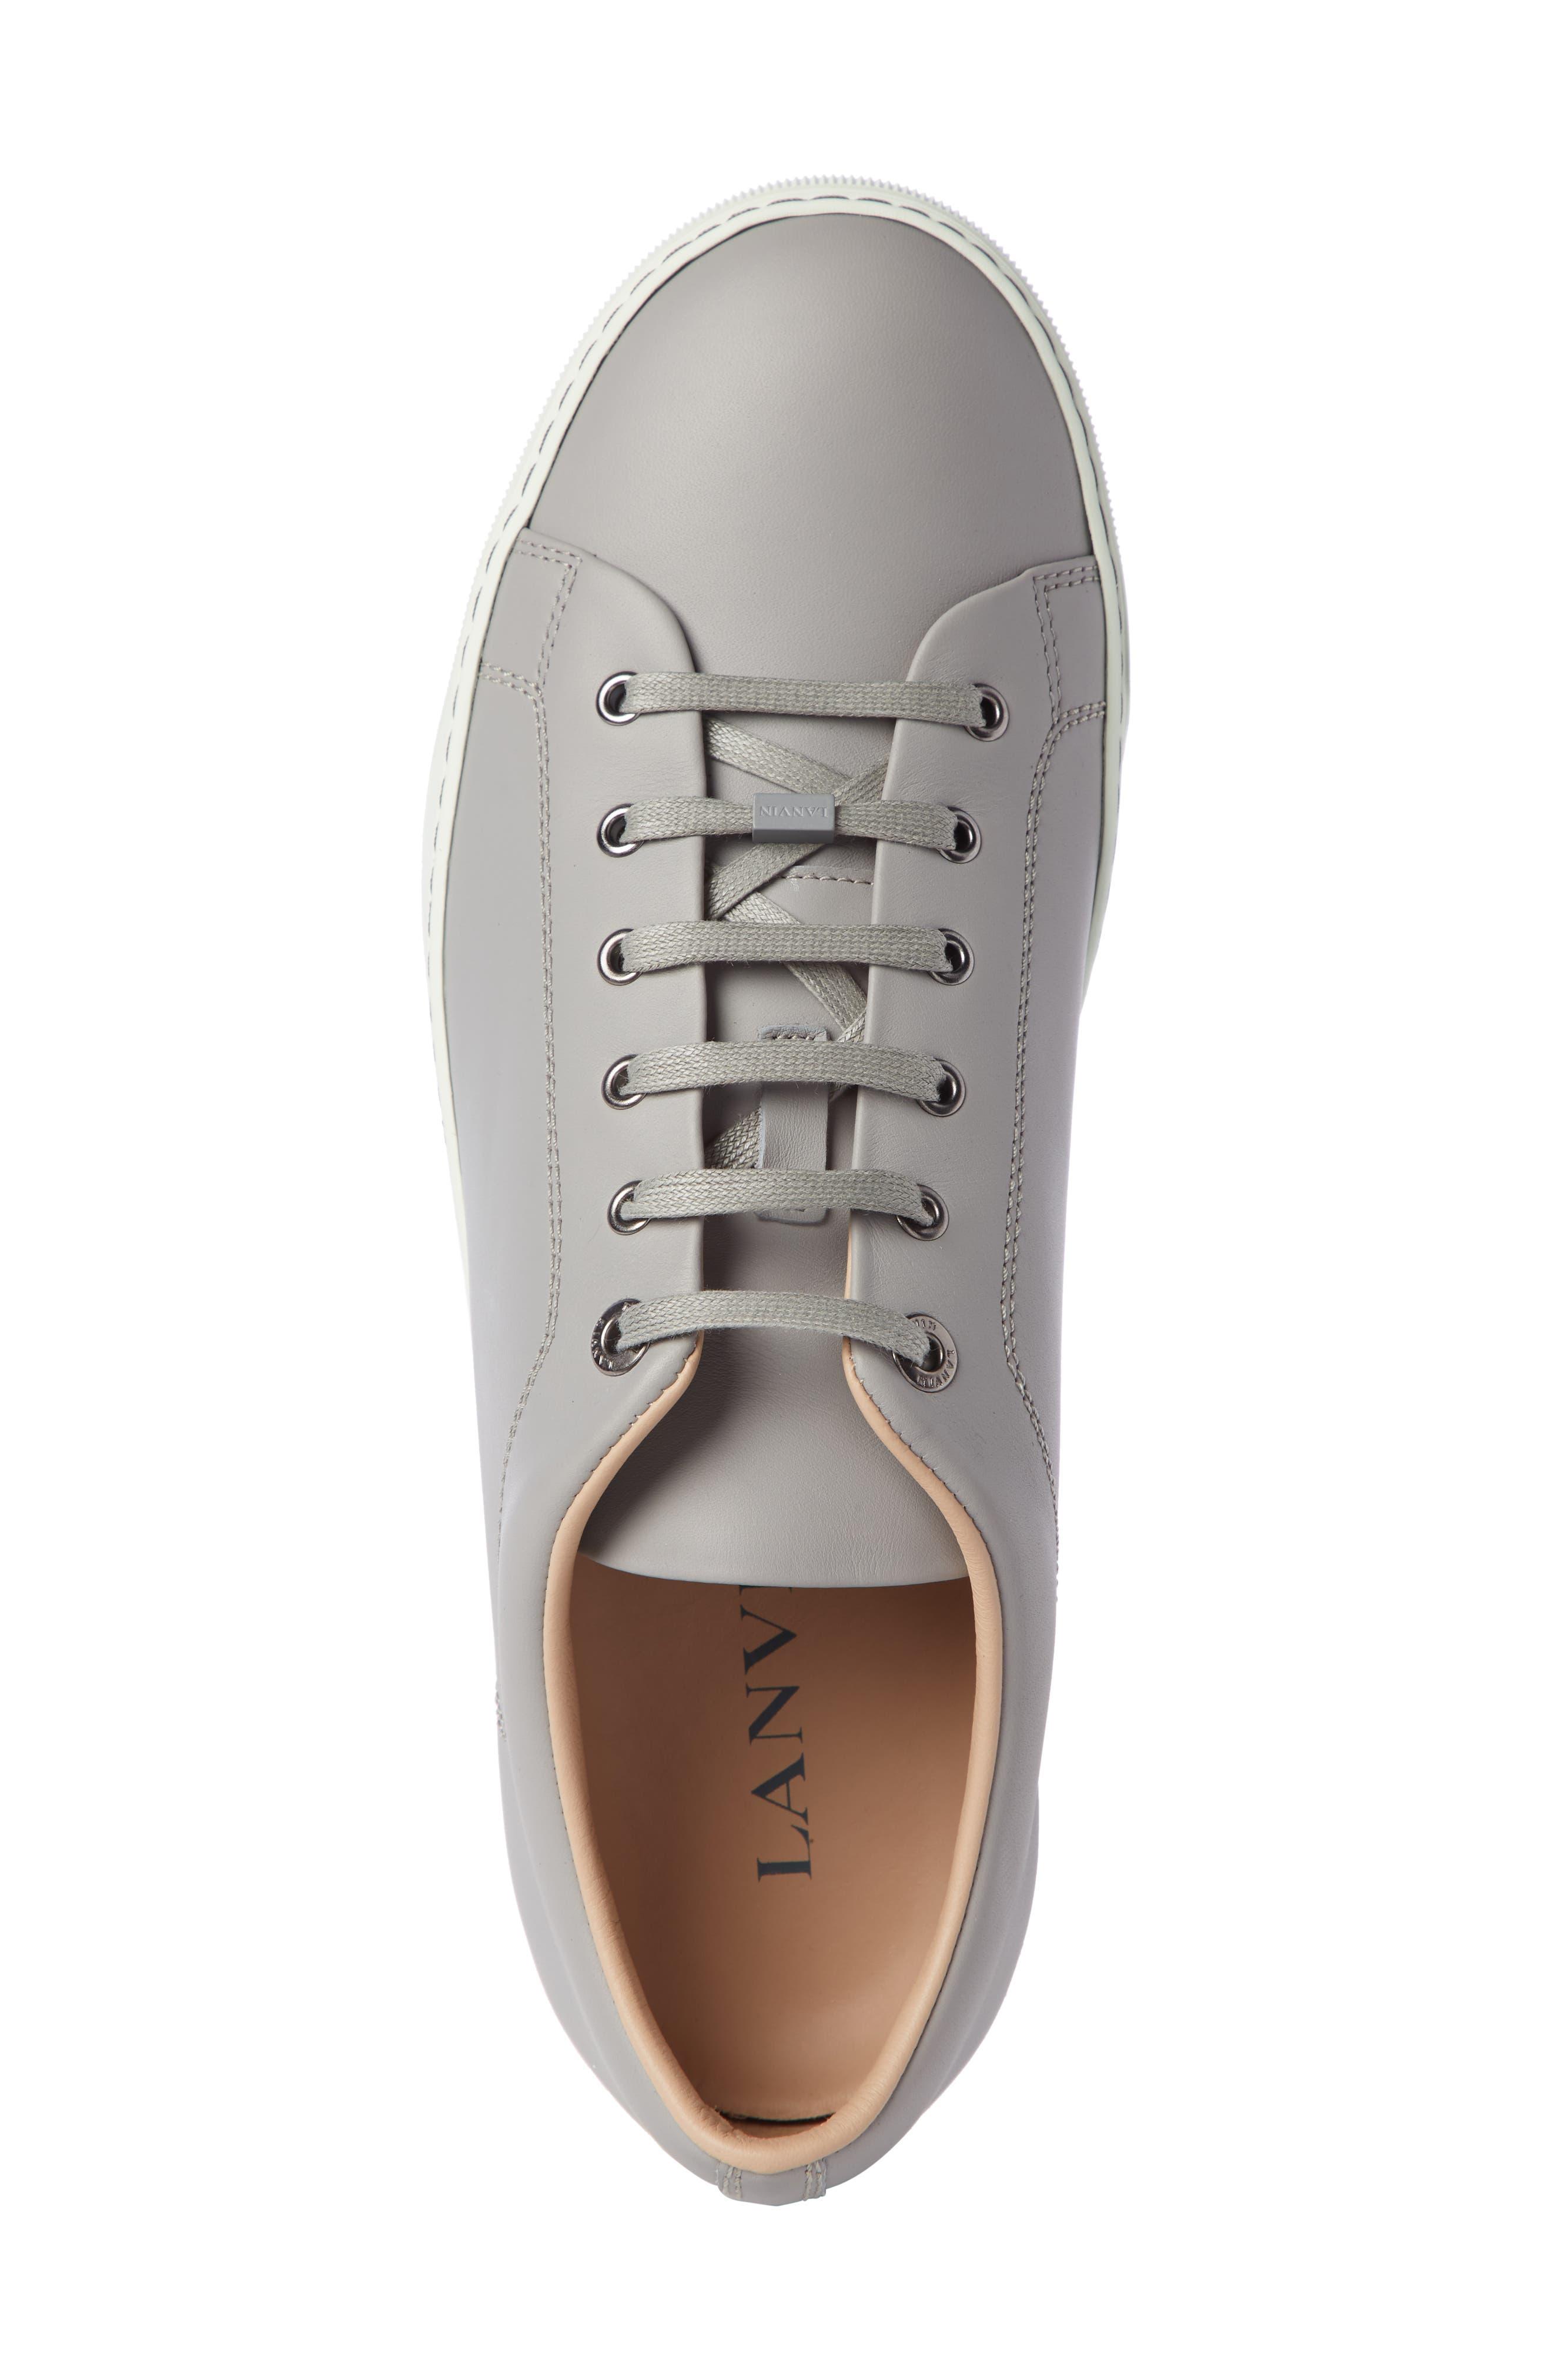 Frye Nappa Sneaker,                             Alternate thumbnail 4, color,                             022